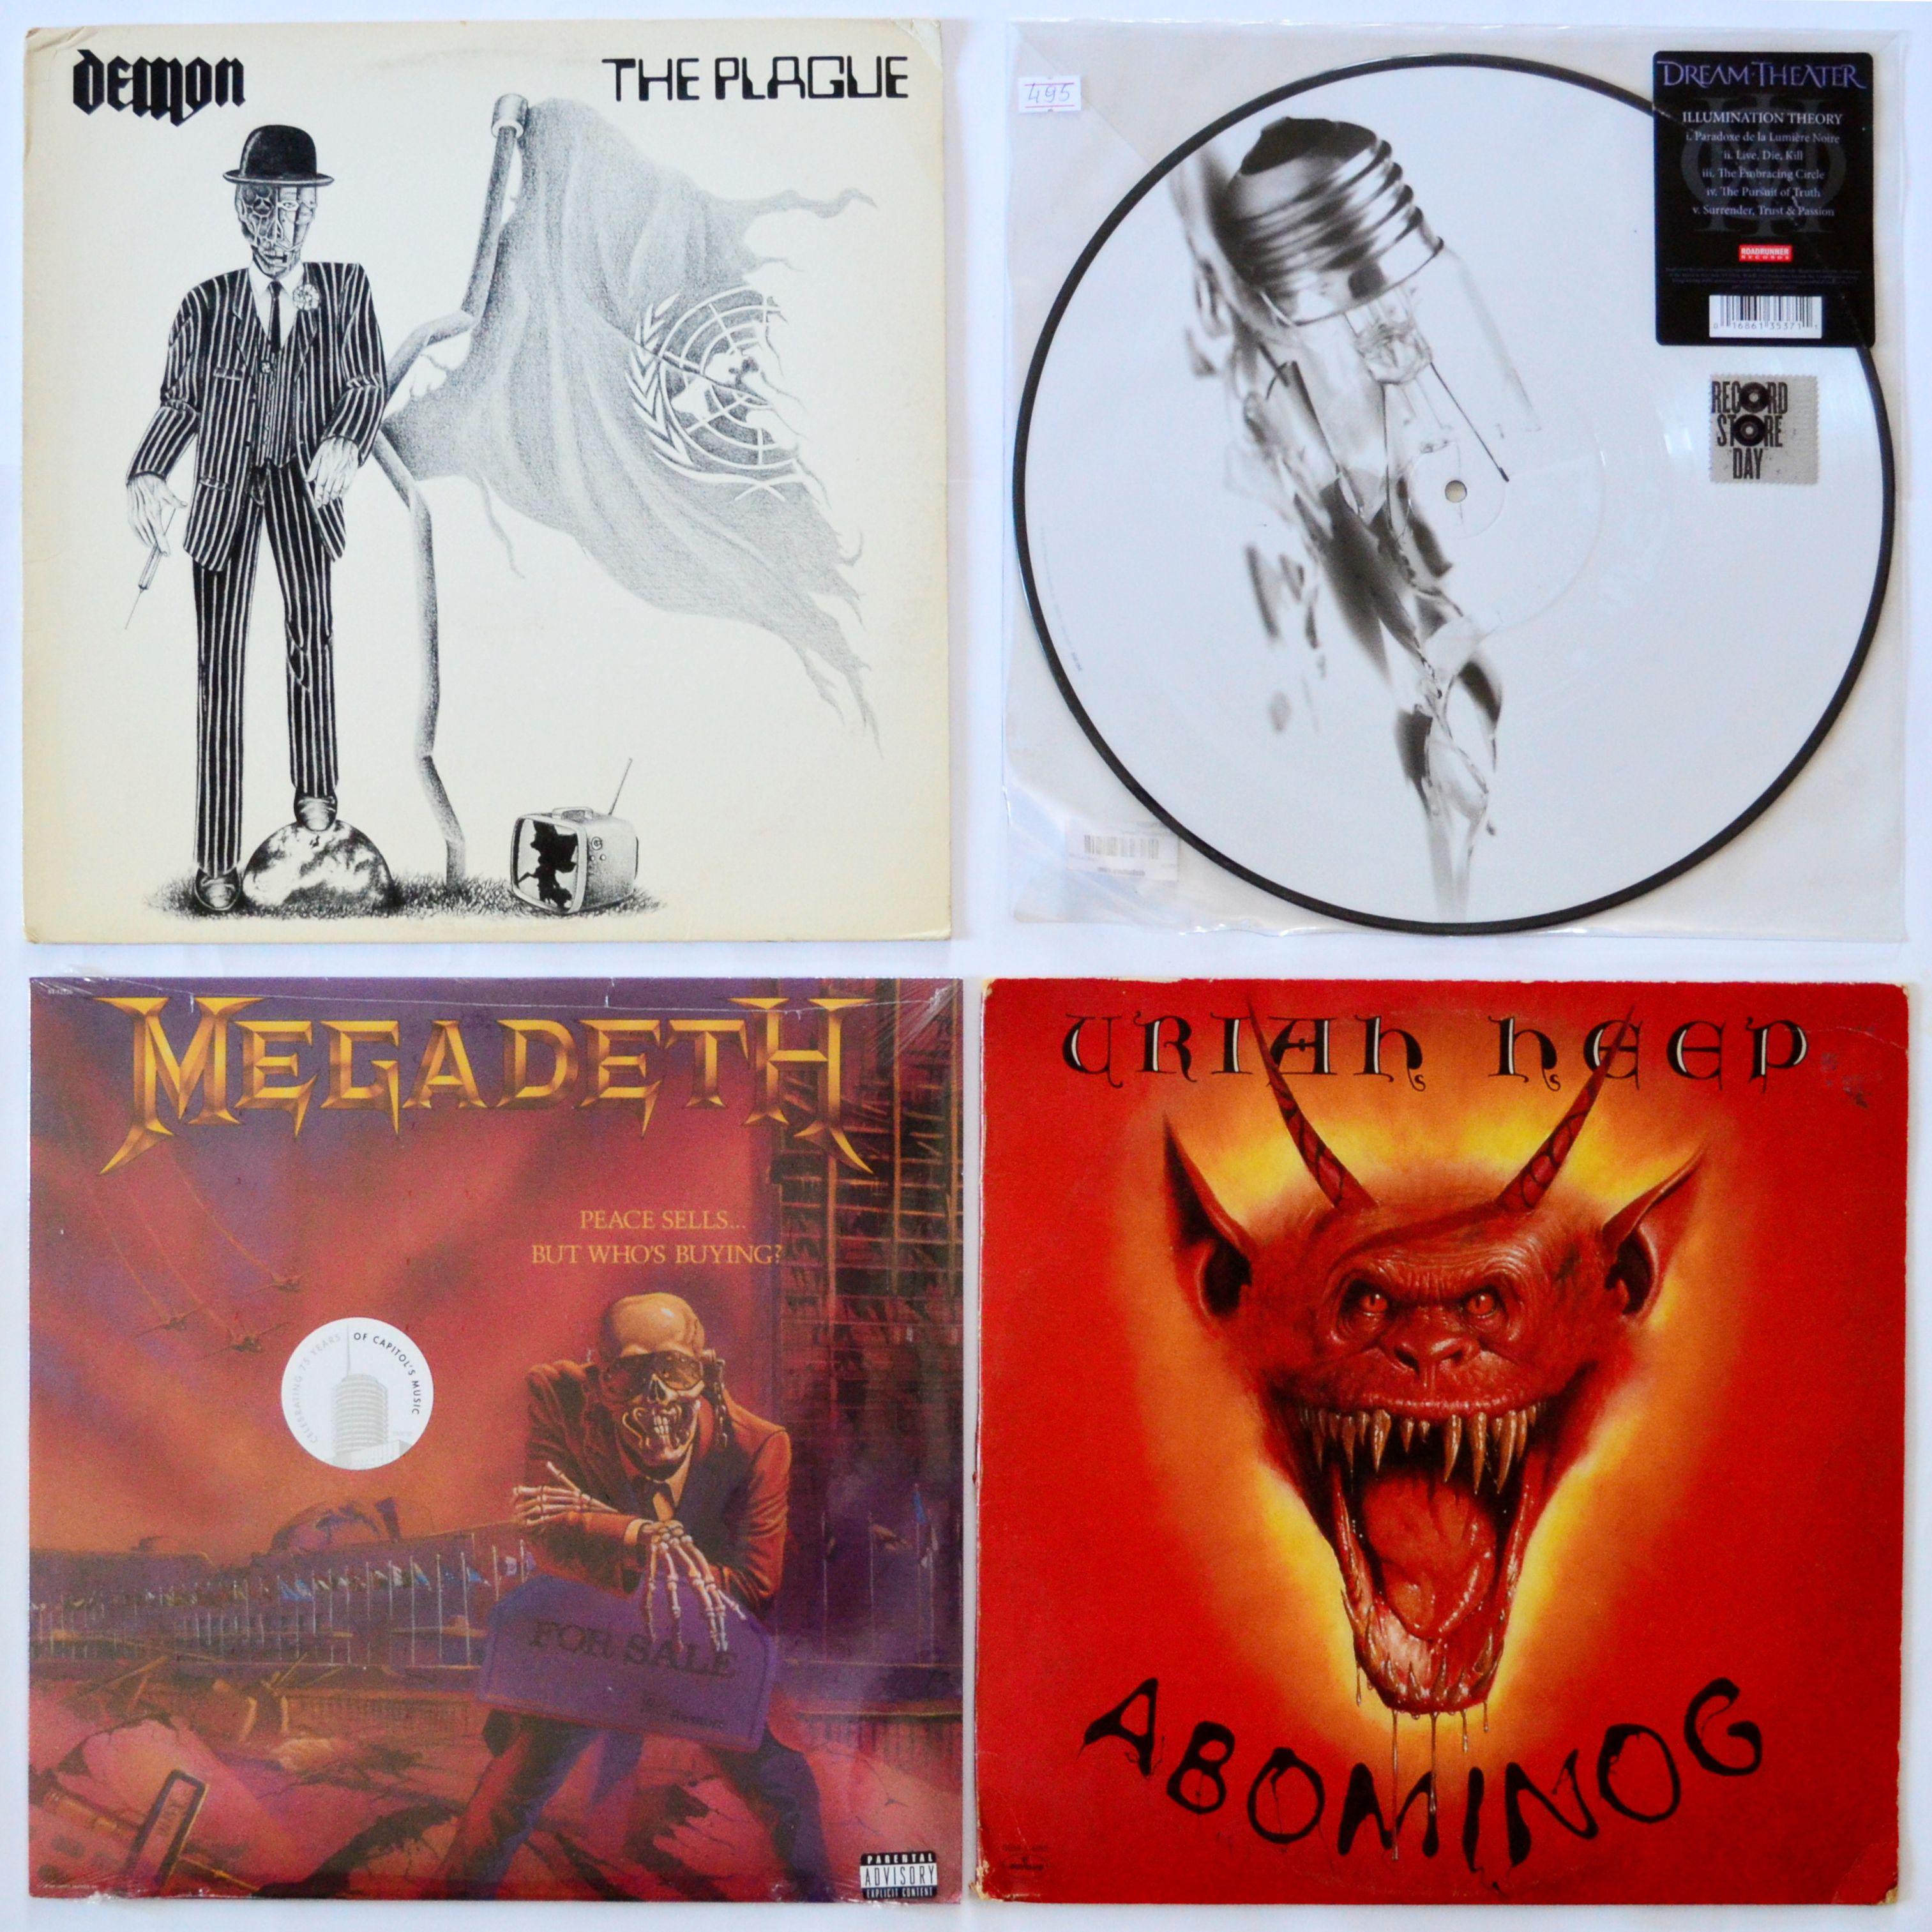 Demon The Plague Atlantic Us 1983 4 4 495 Grn Dream Theater Illumination Theory Roadrunner Records Us 2014 5 Megadeth Dream Theater Vinyl